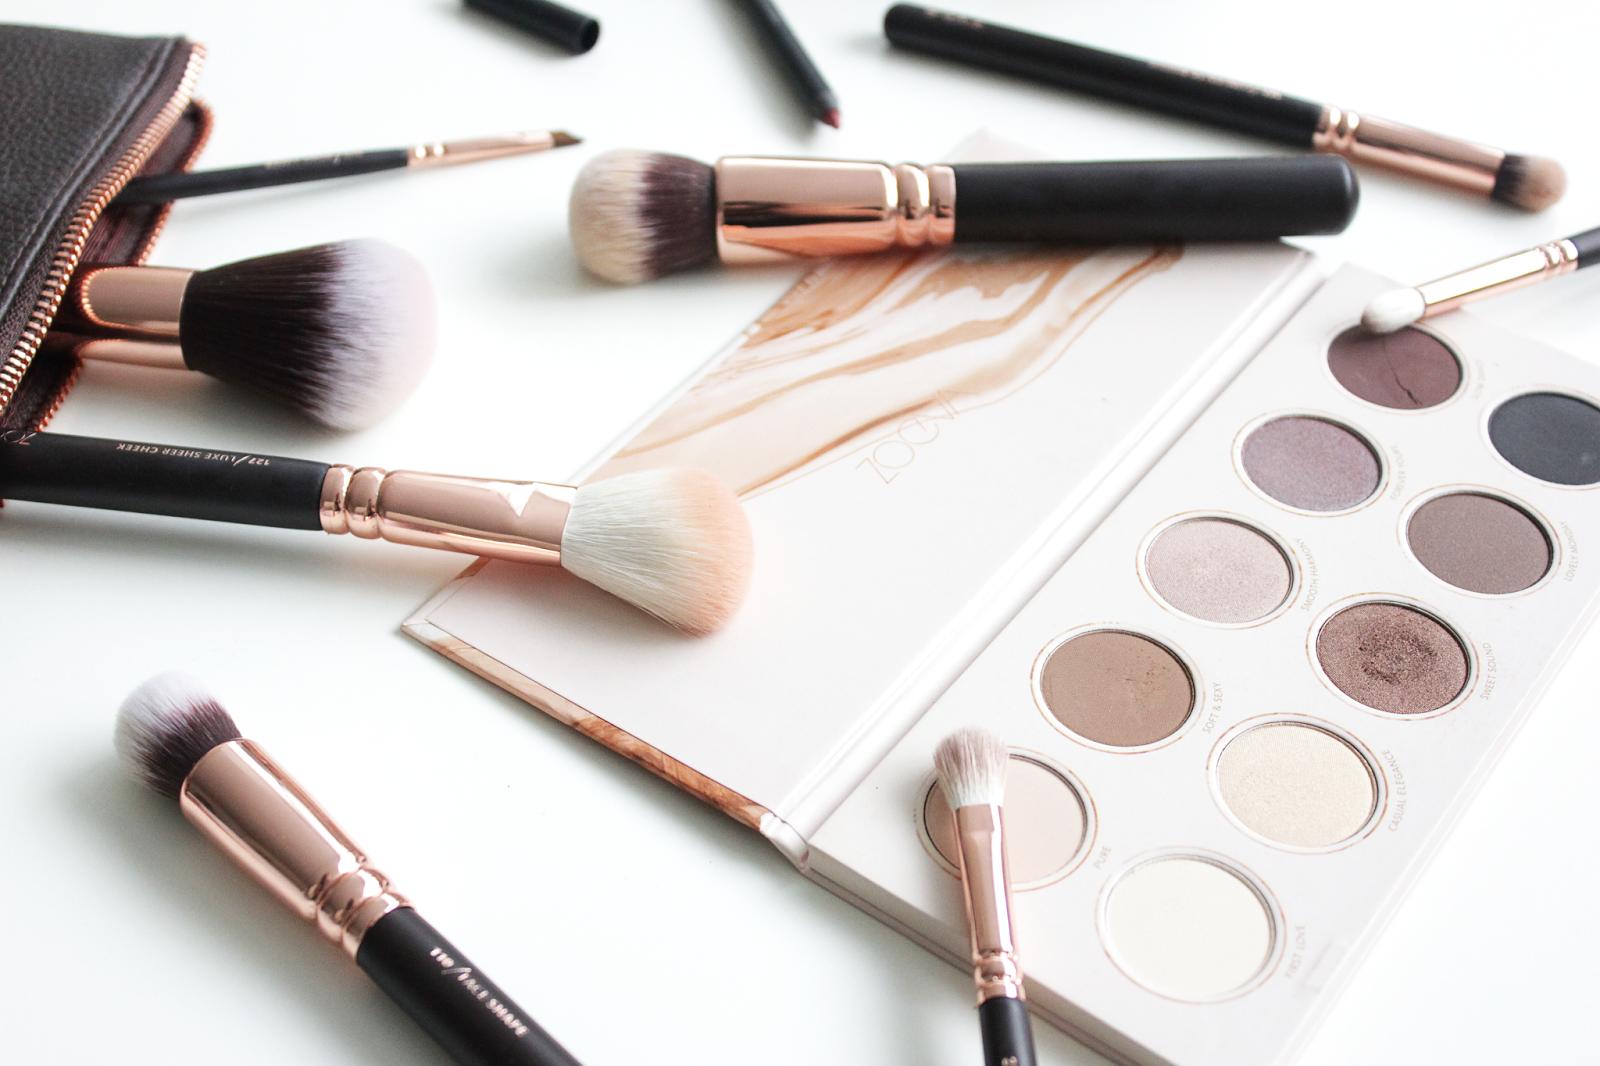 Zoeva Cosmetics, Rose Gold Makeup Brushes